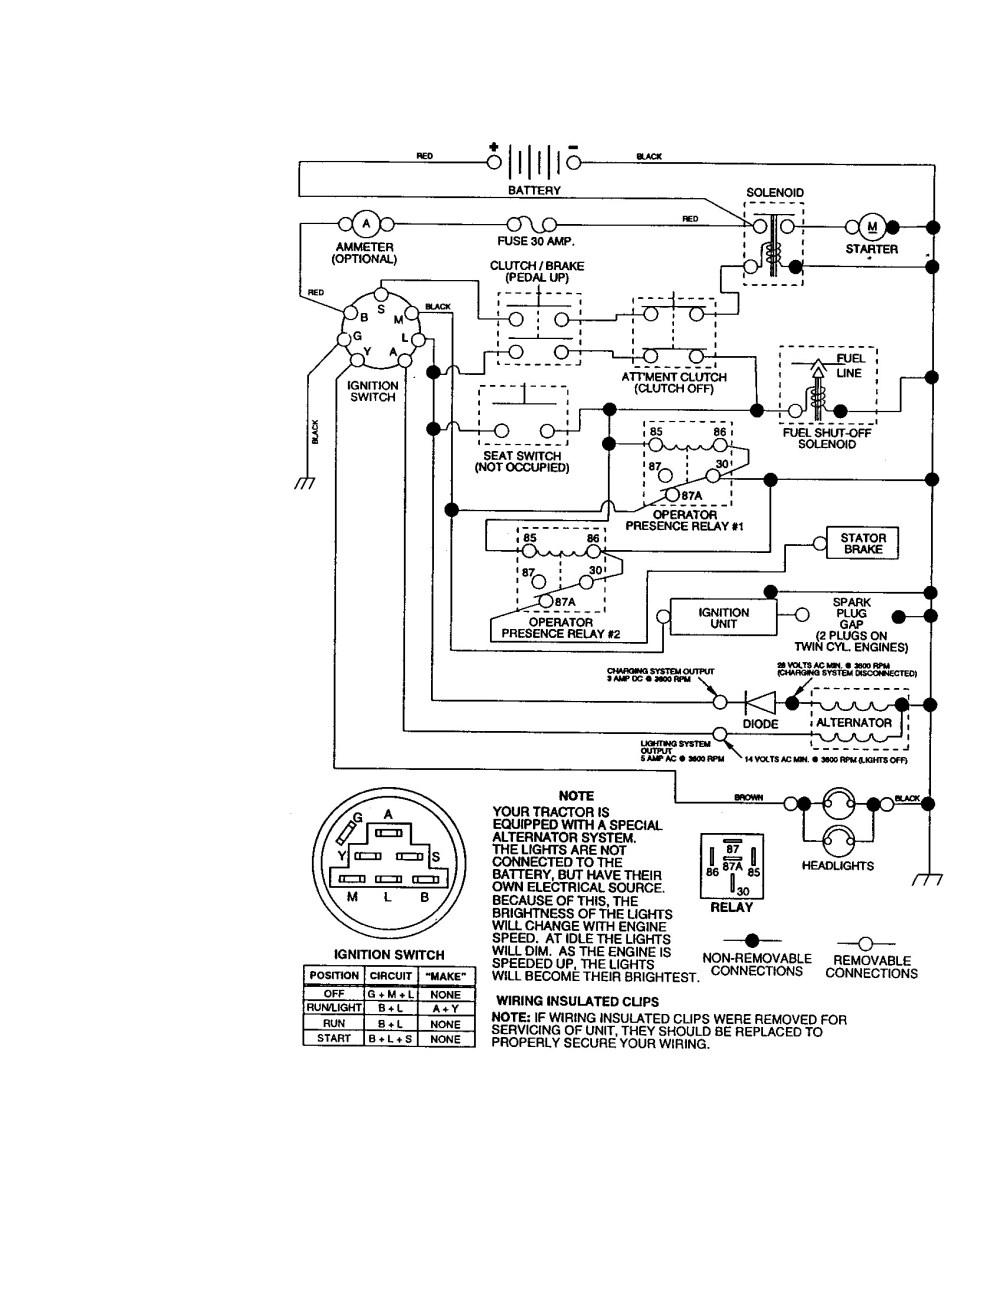 medium resolution of craftsman lawn mower model 917 wiring diagram wiring diagram for kohler mand new 917 craftsman